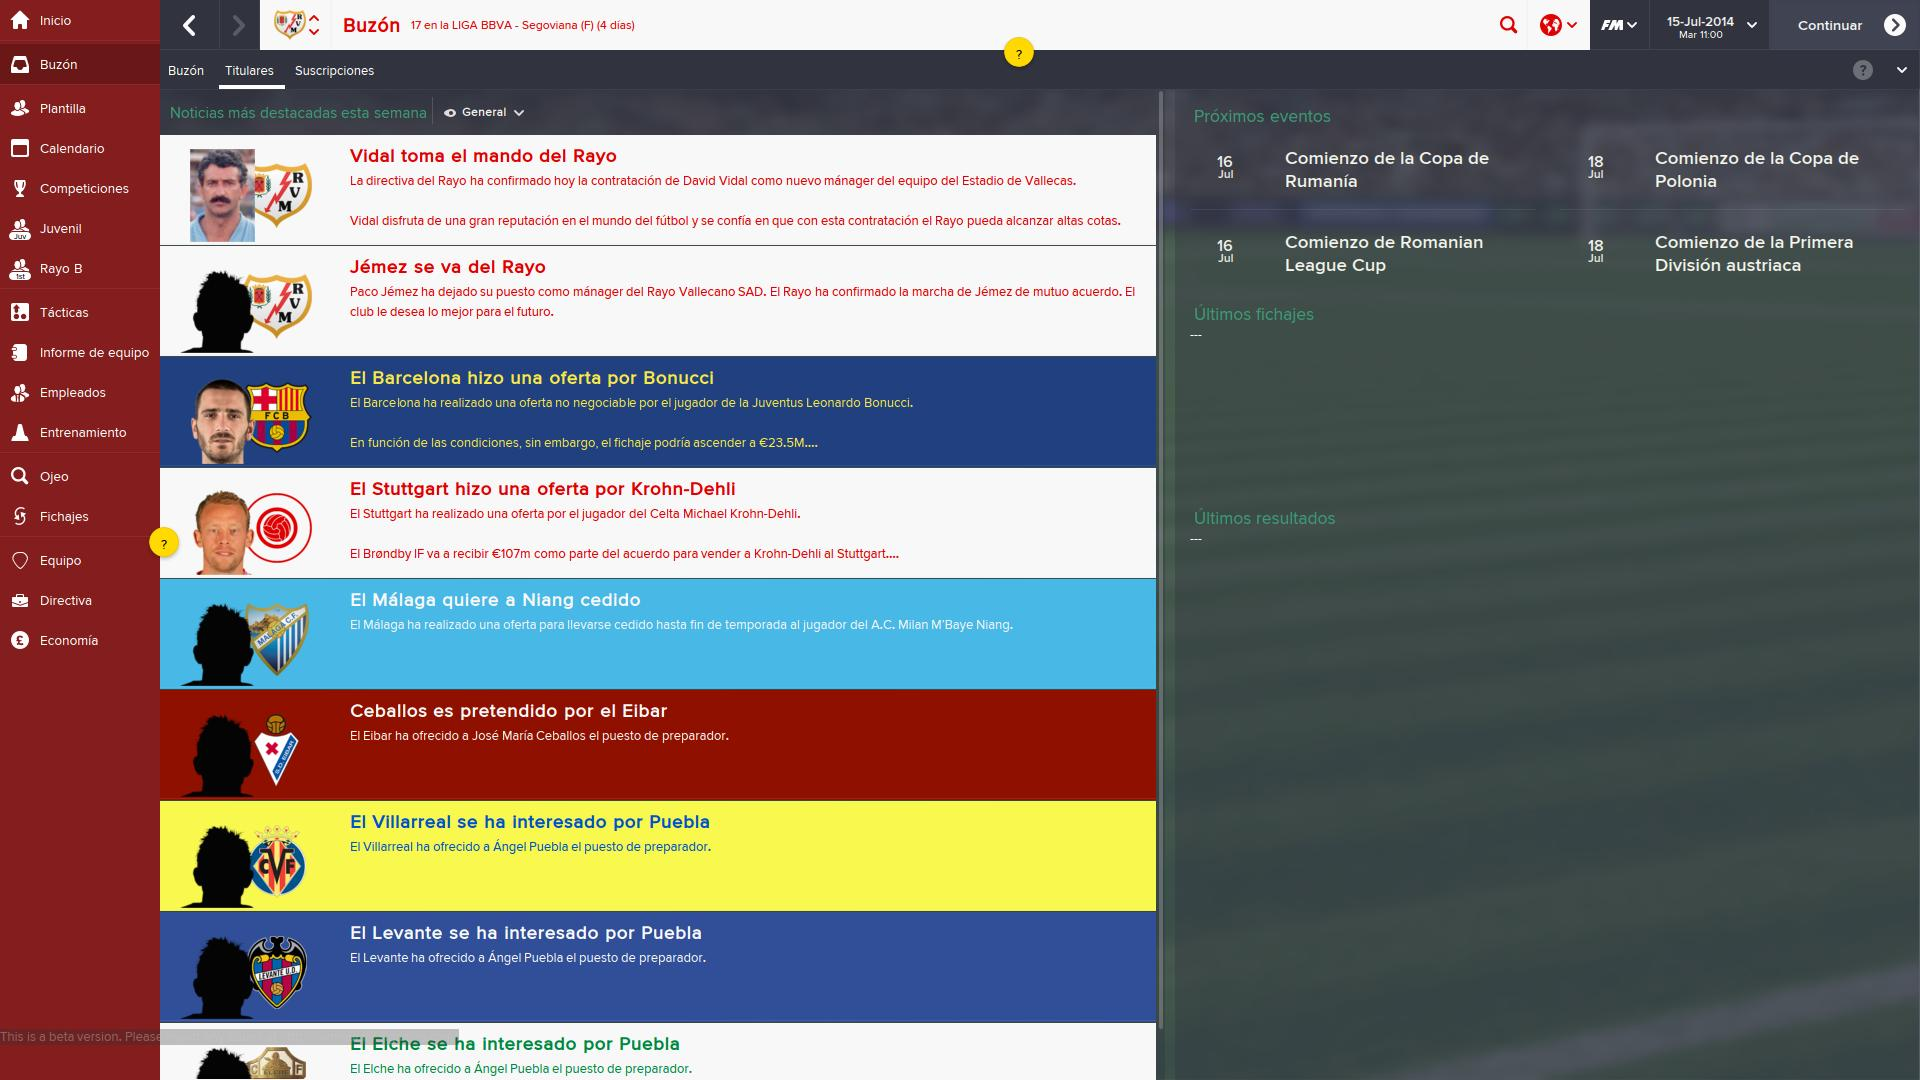 Avance Stuttgart avance de football manager 2015 para pc hobbyconsolas juegos